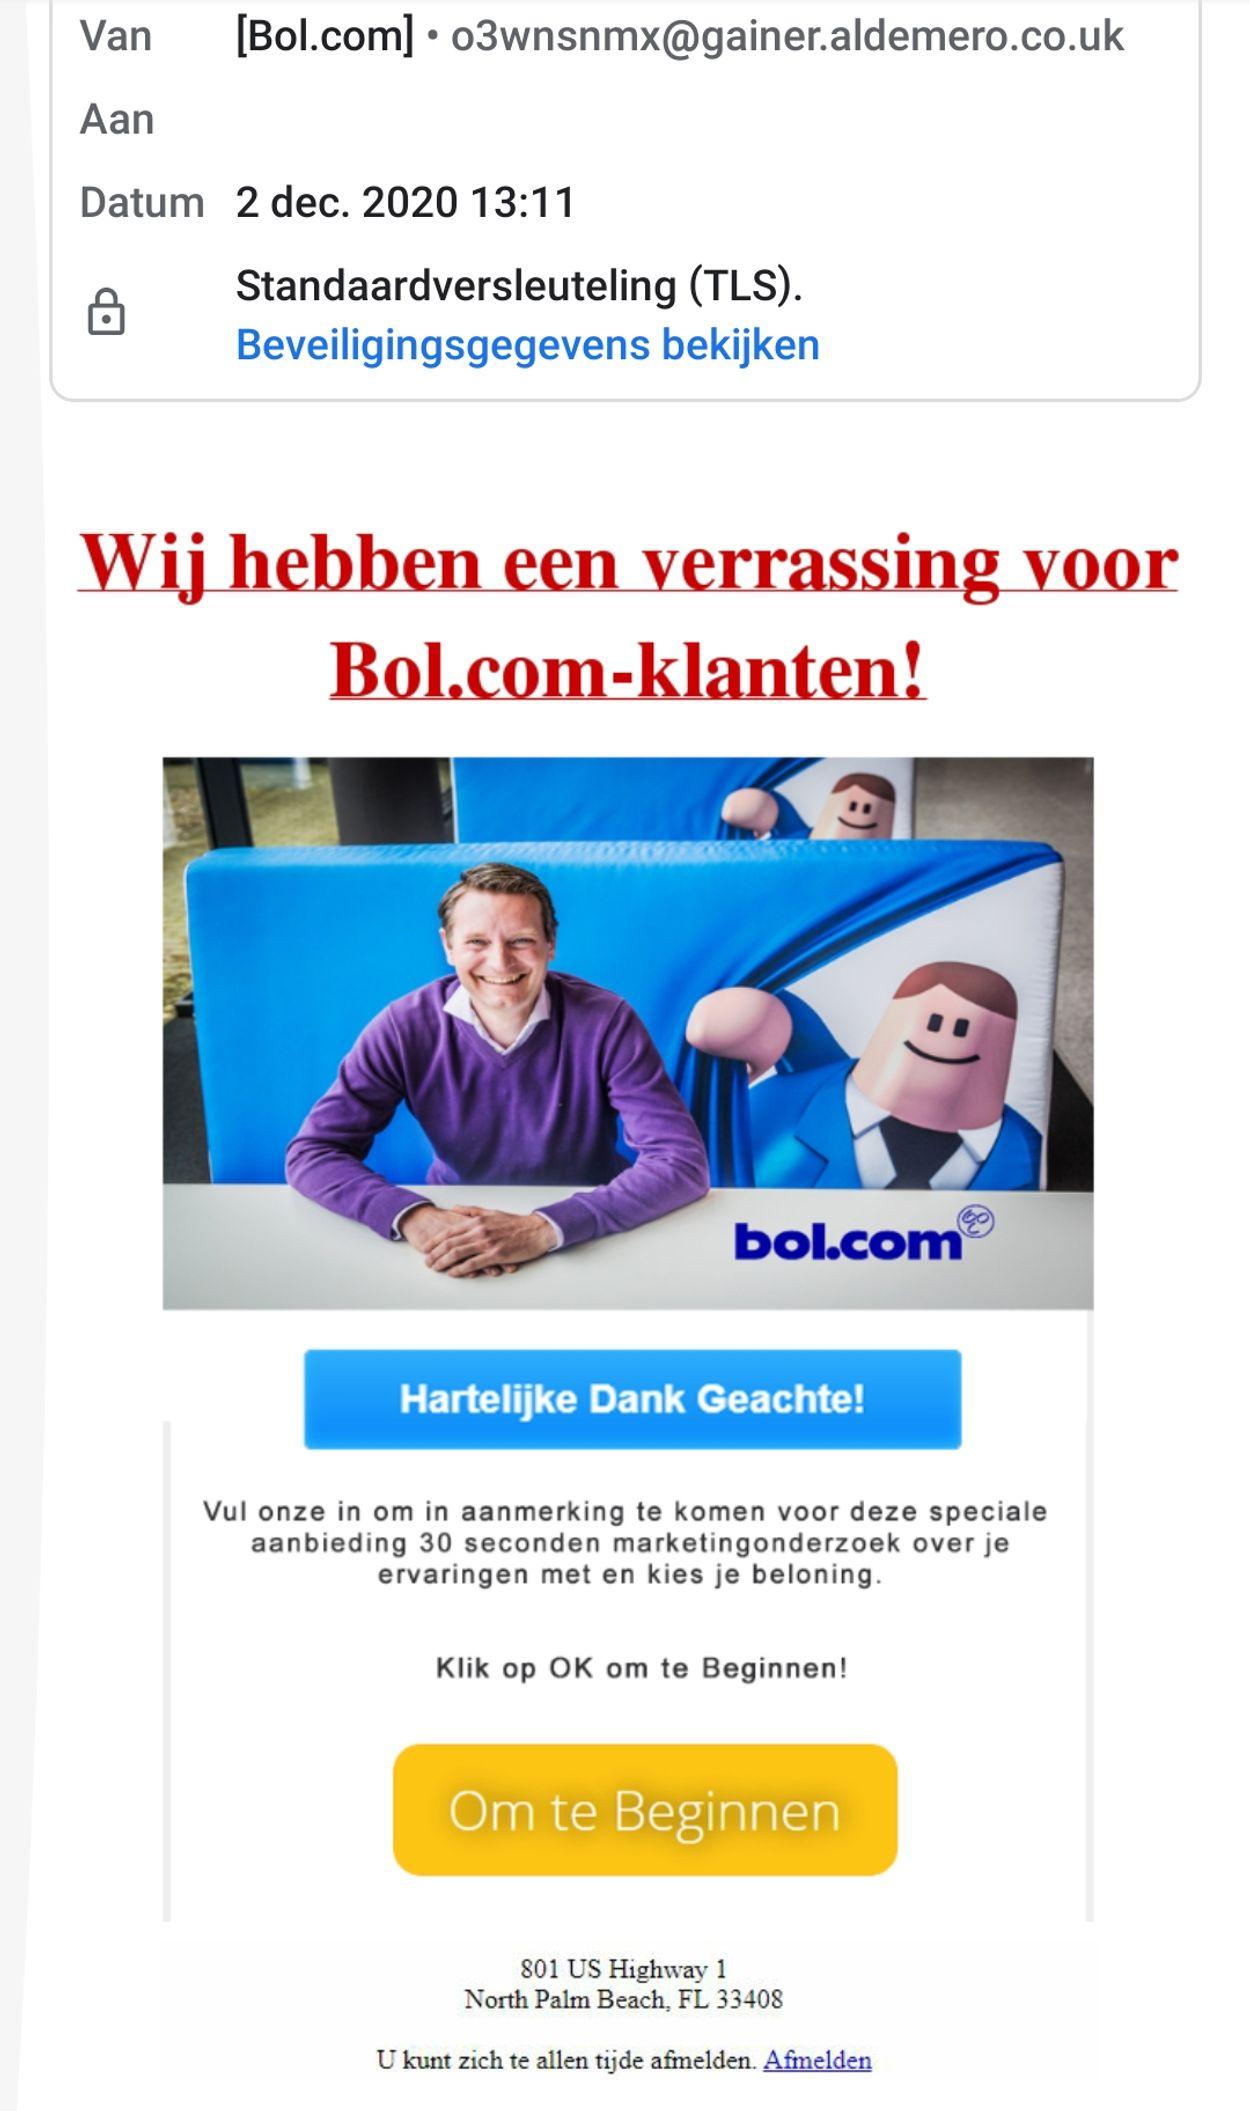 bol.com phishingmail december 2020